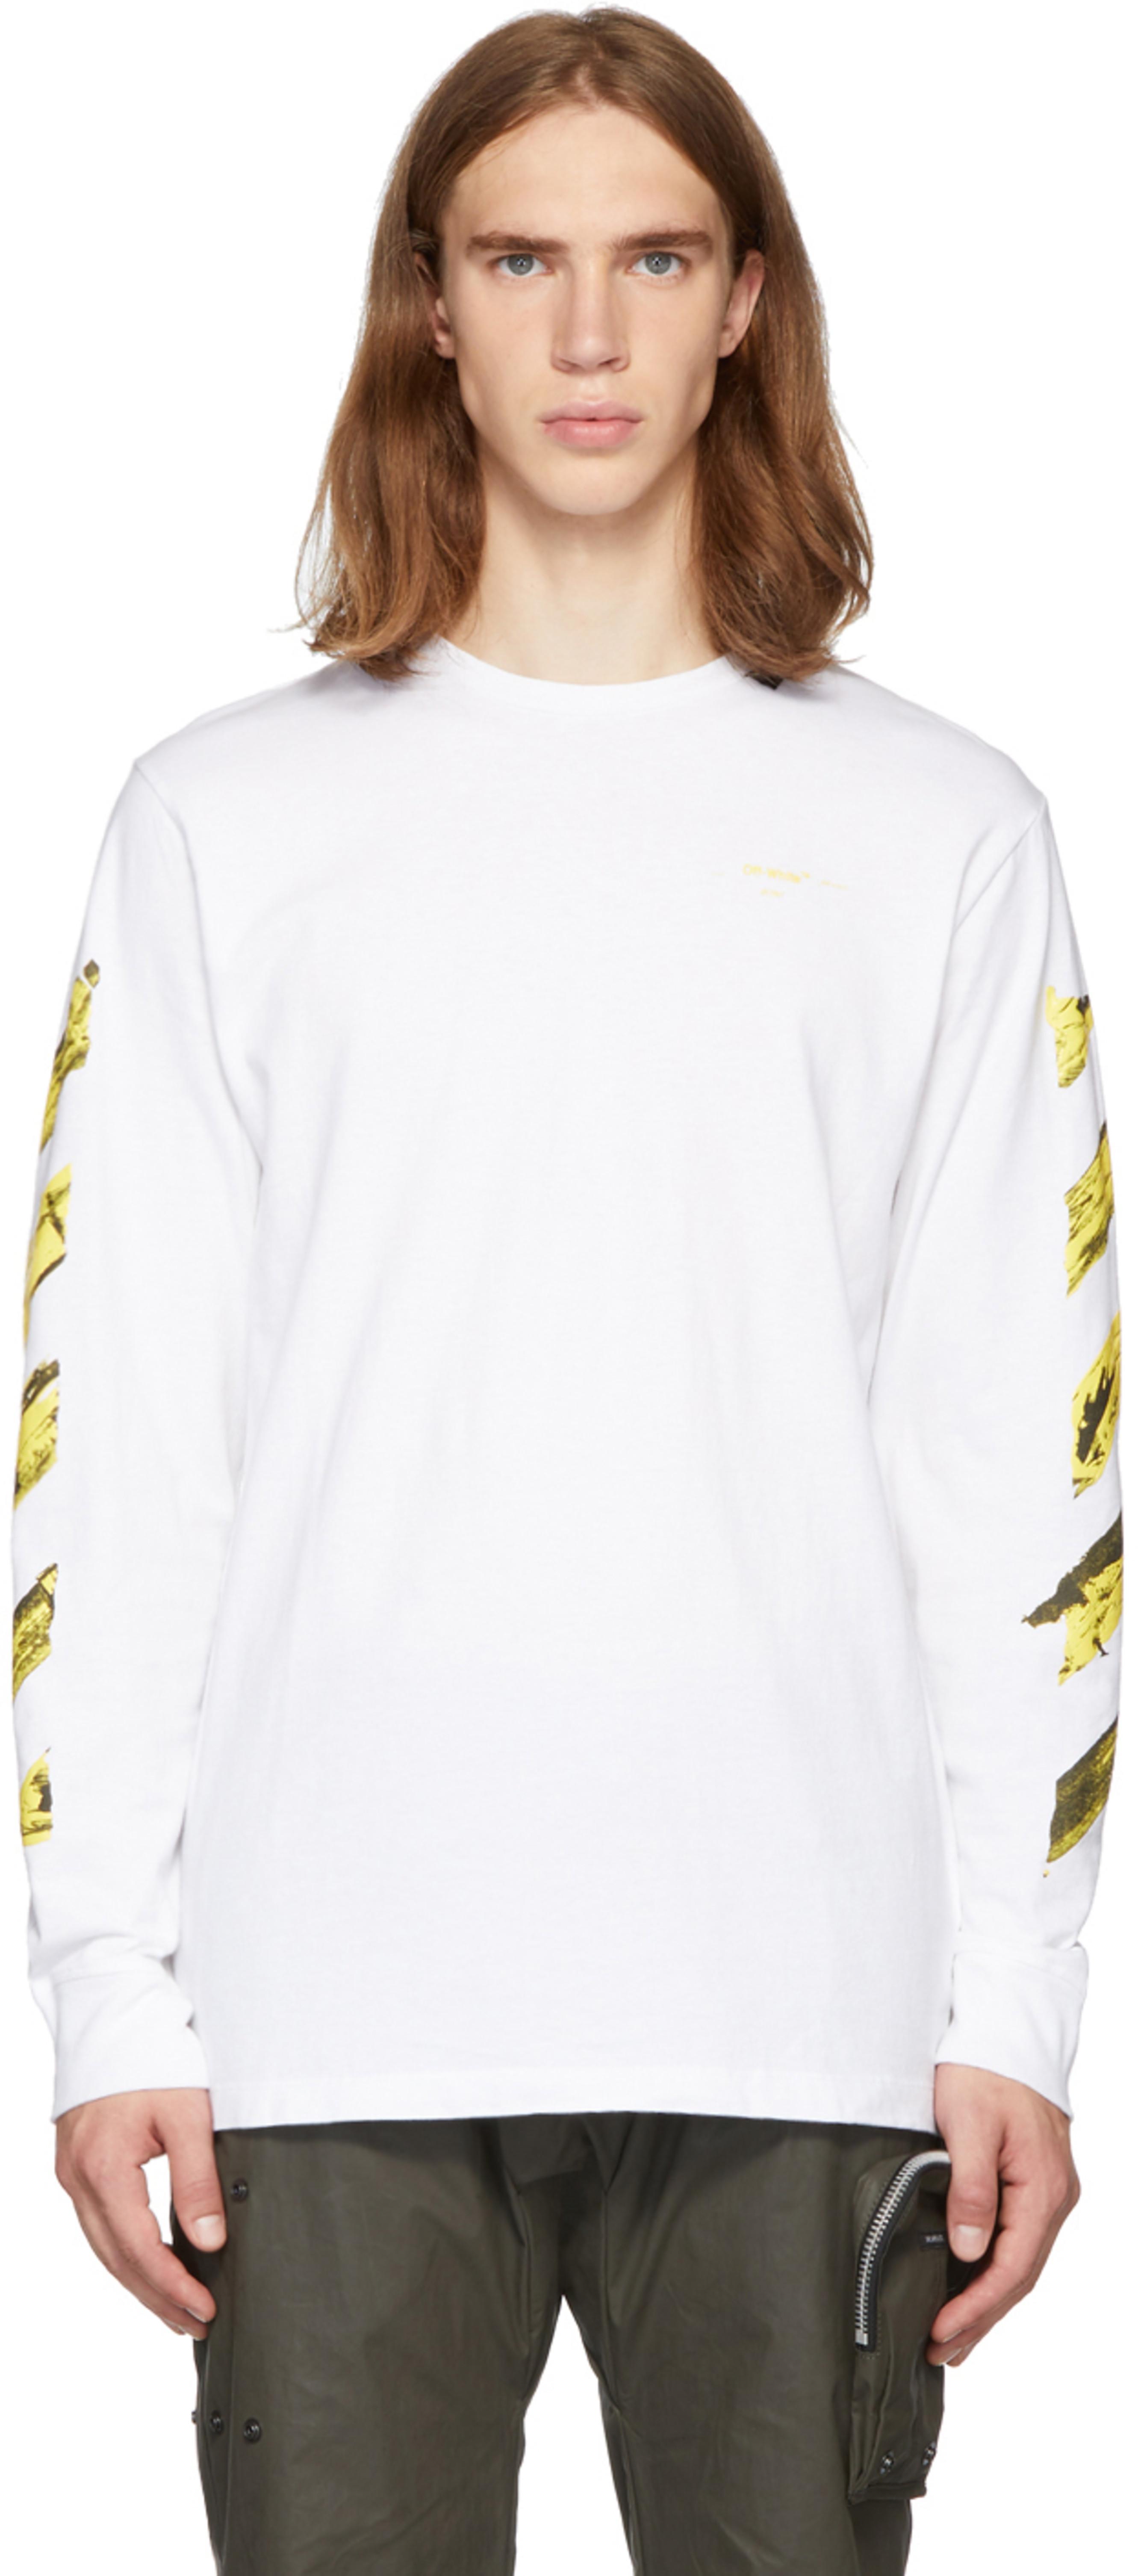 f29bb0503a SSENSE Exclusive White & Yellow Acrylic Arrows Long Sleeve T-Shirt